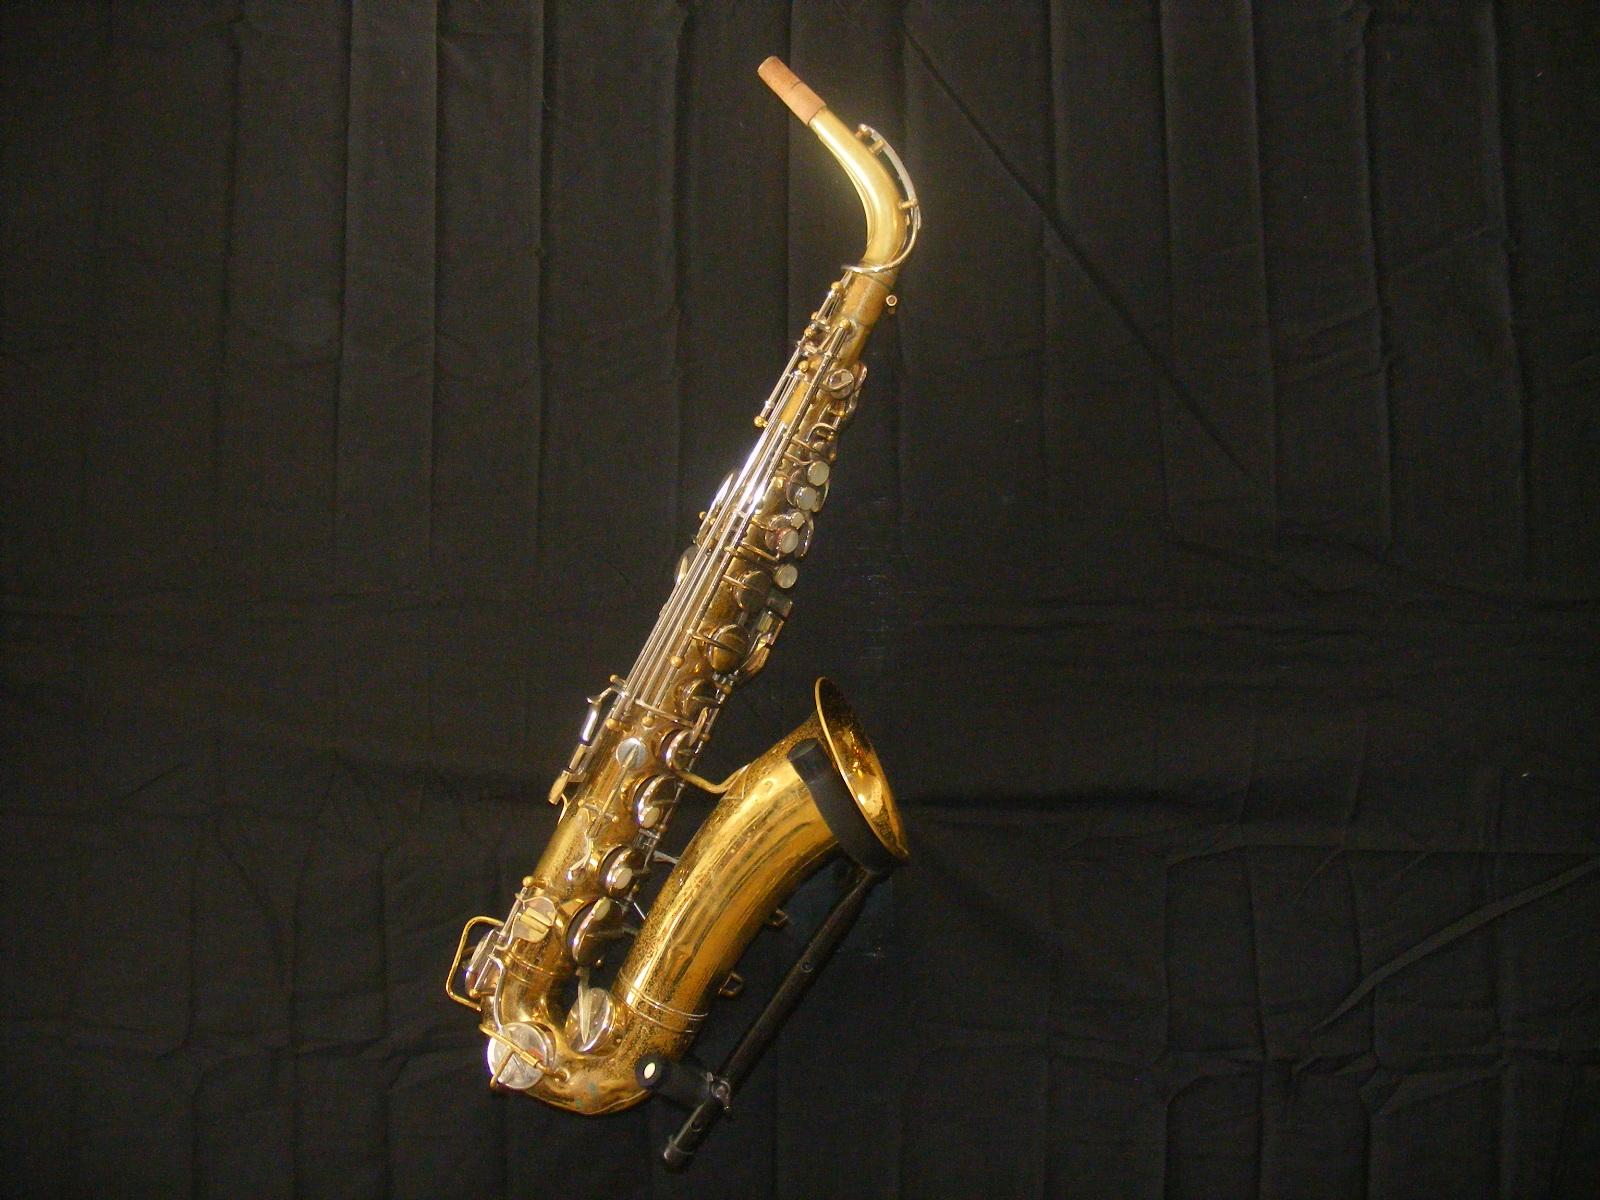 Alto Saxophone Wallpaper Martin imperial alto sax 1600x1200